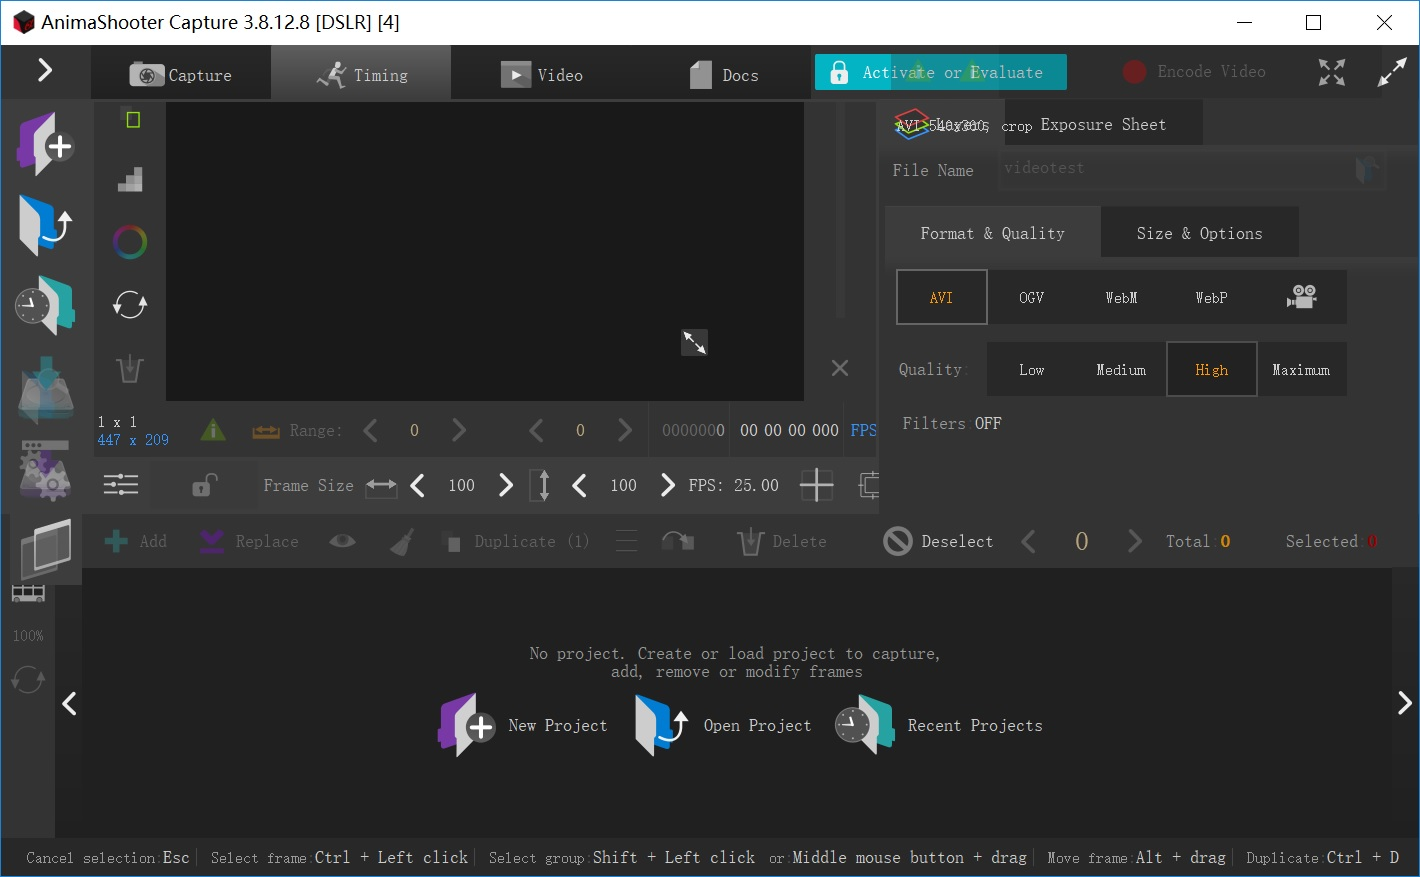 AnimaShooter Capture 破解版.jpg